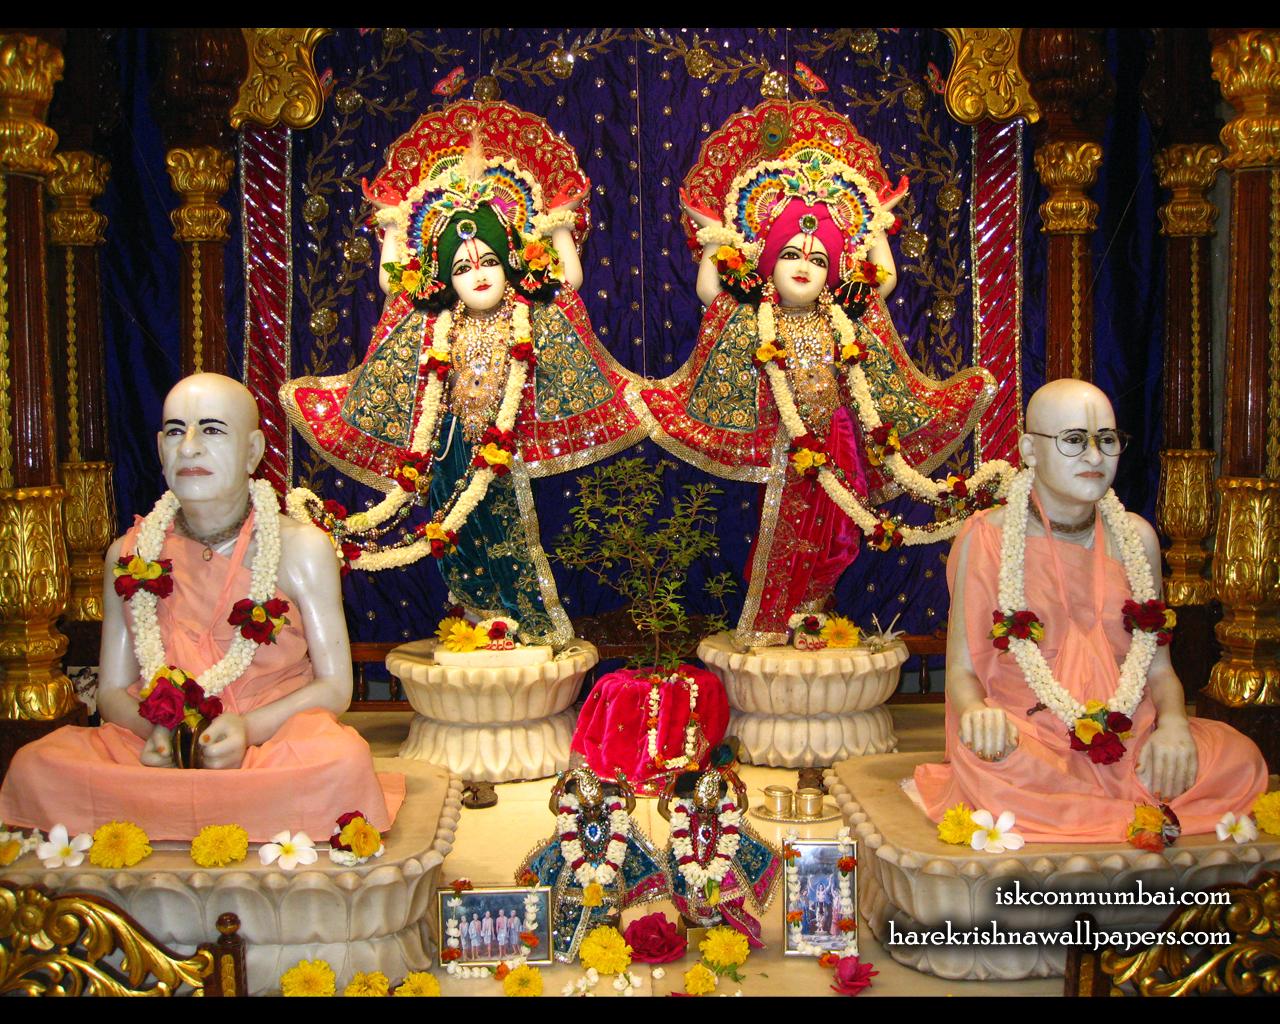 Sri Sri Gaura Nitai With Acharyas Wallpaper (019) Size 1280x1024 Download